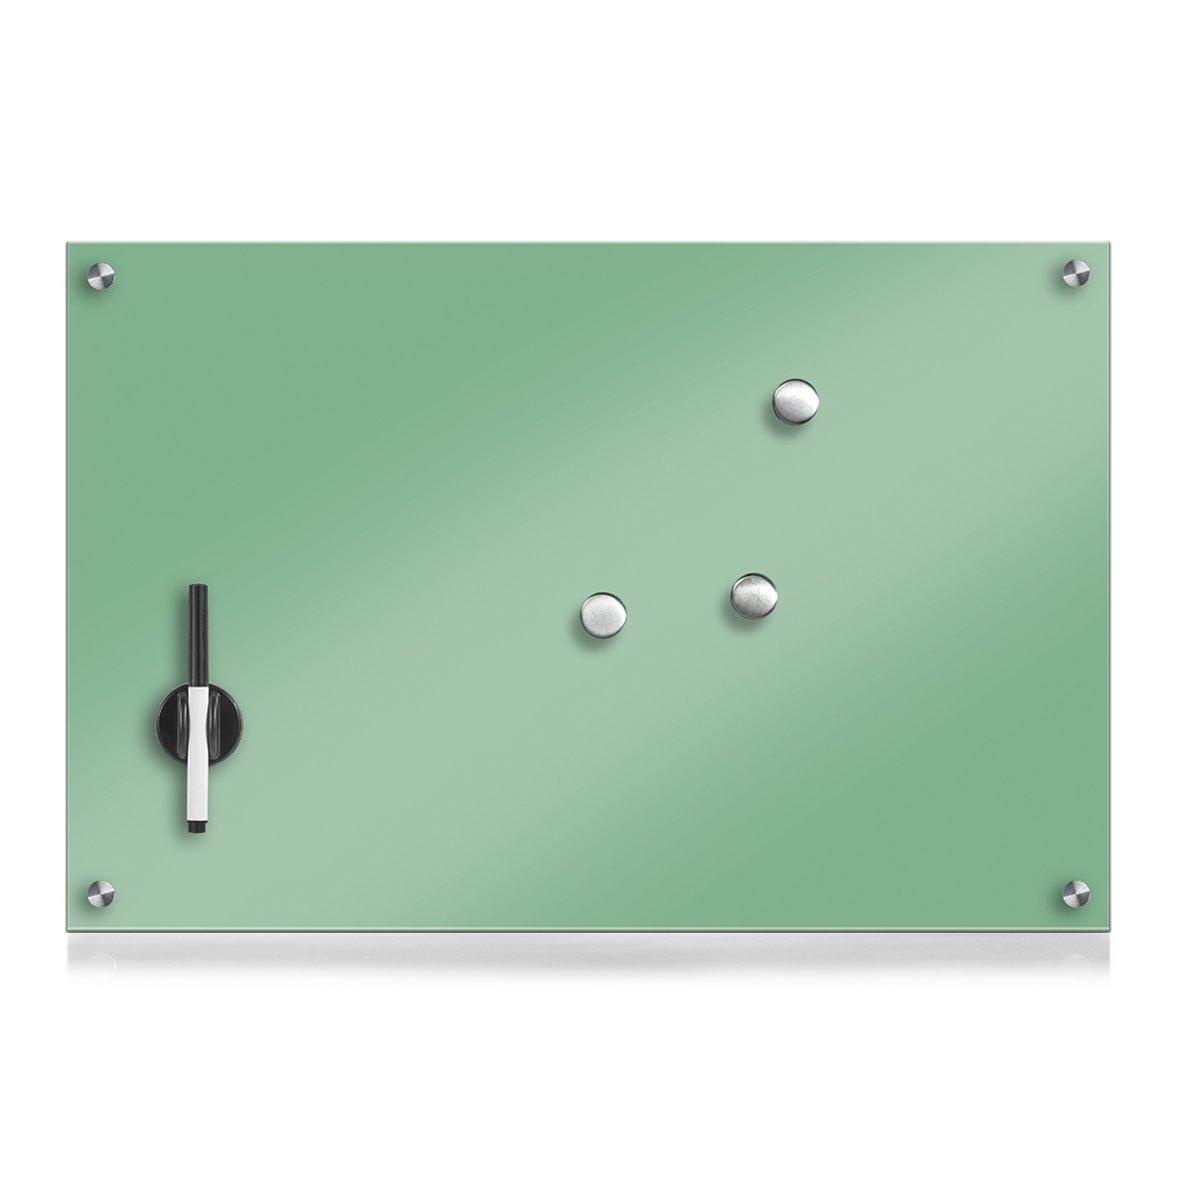 Zeller Black Glass Notice Board 60x 40x 1cm Mint Green by Zeller (Image #1)